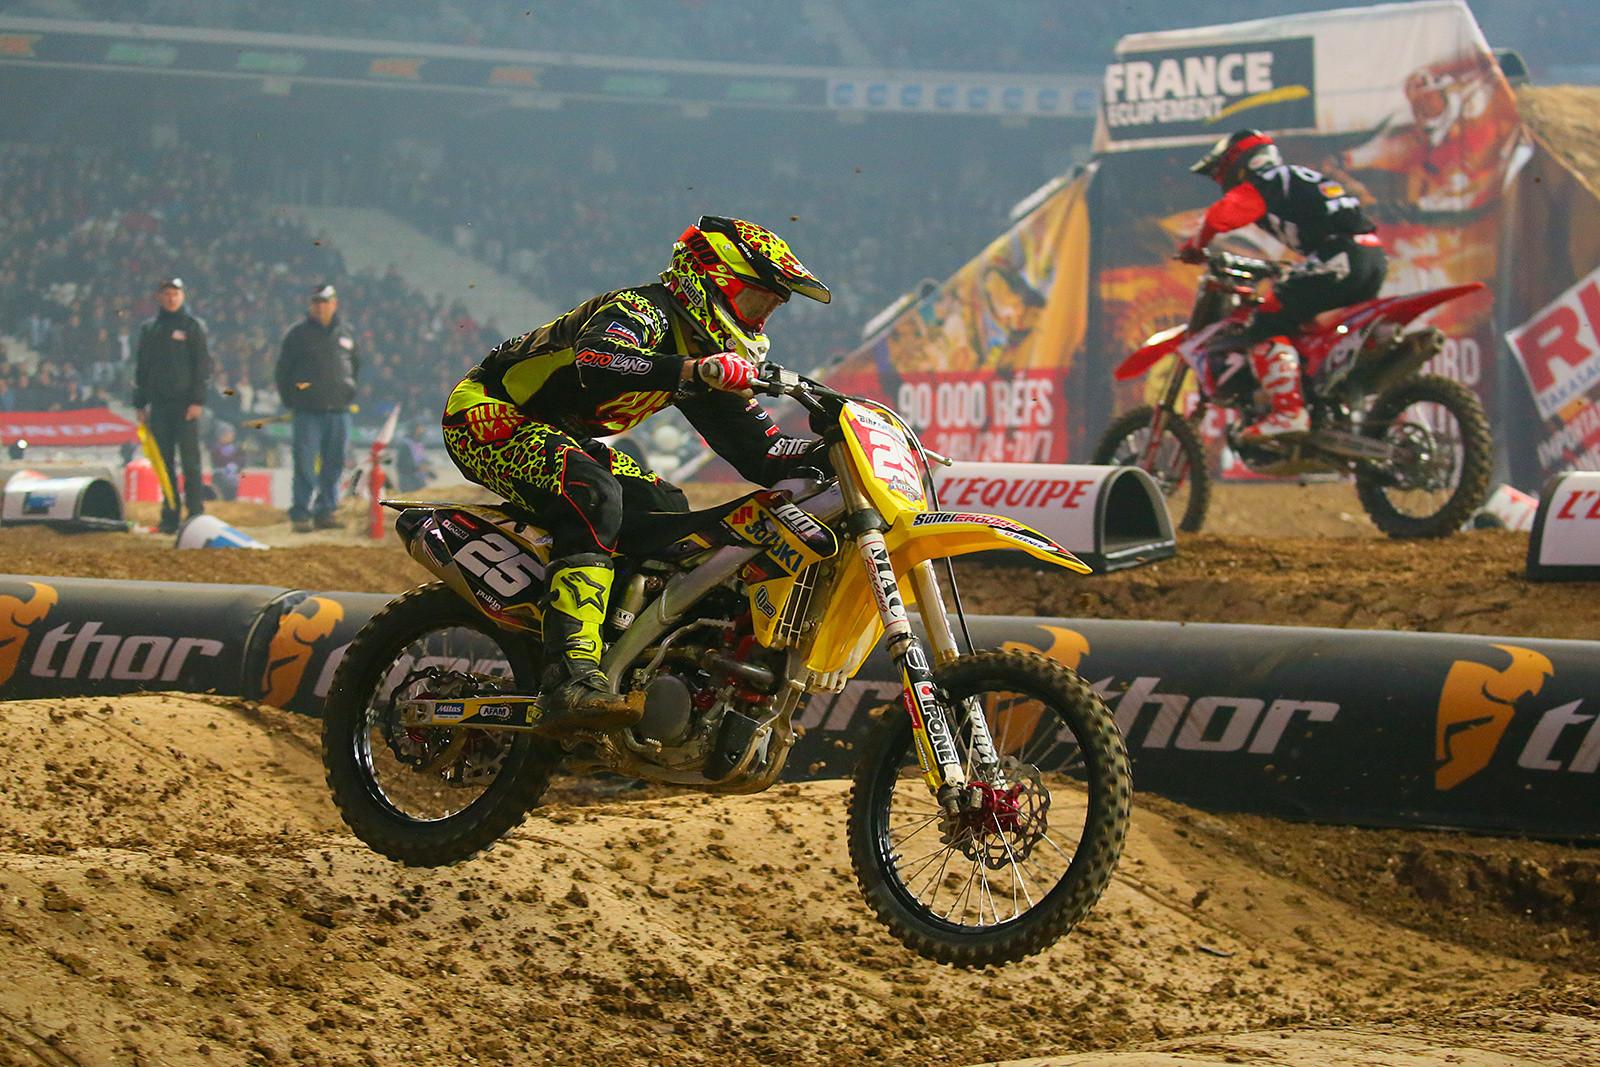 Florent Richier - Photo Gallery: Paris-Lille Supercross, Day 2 - Motocross Pictures - Vital MX